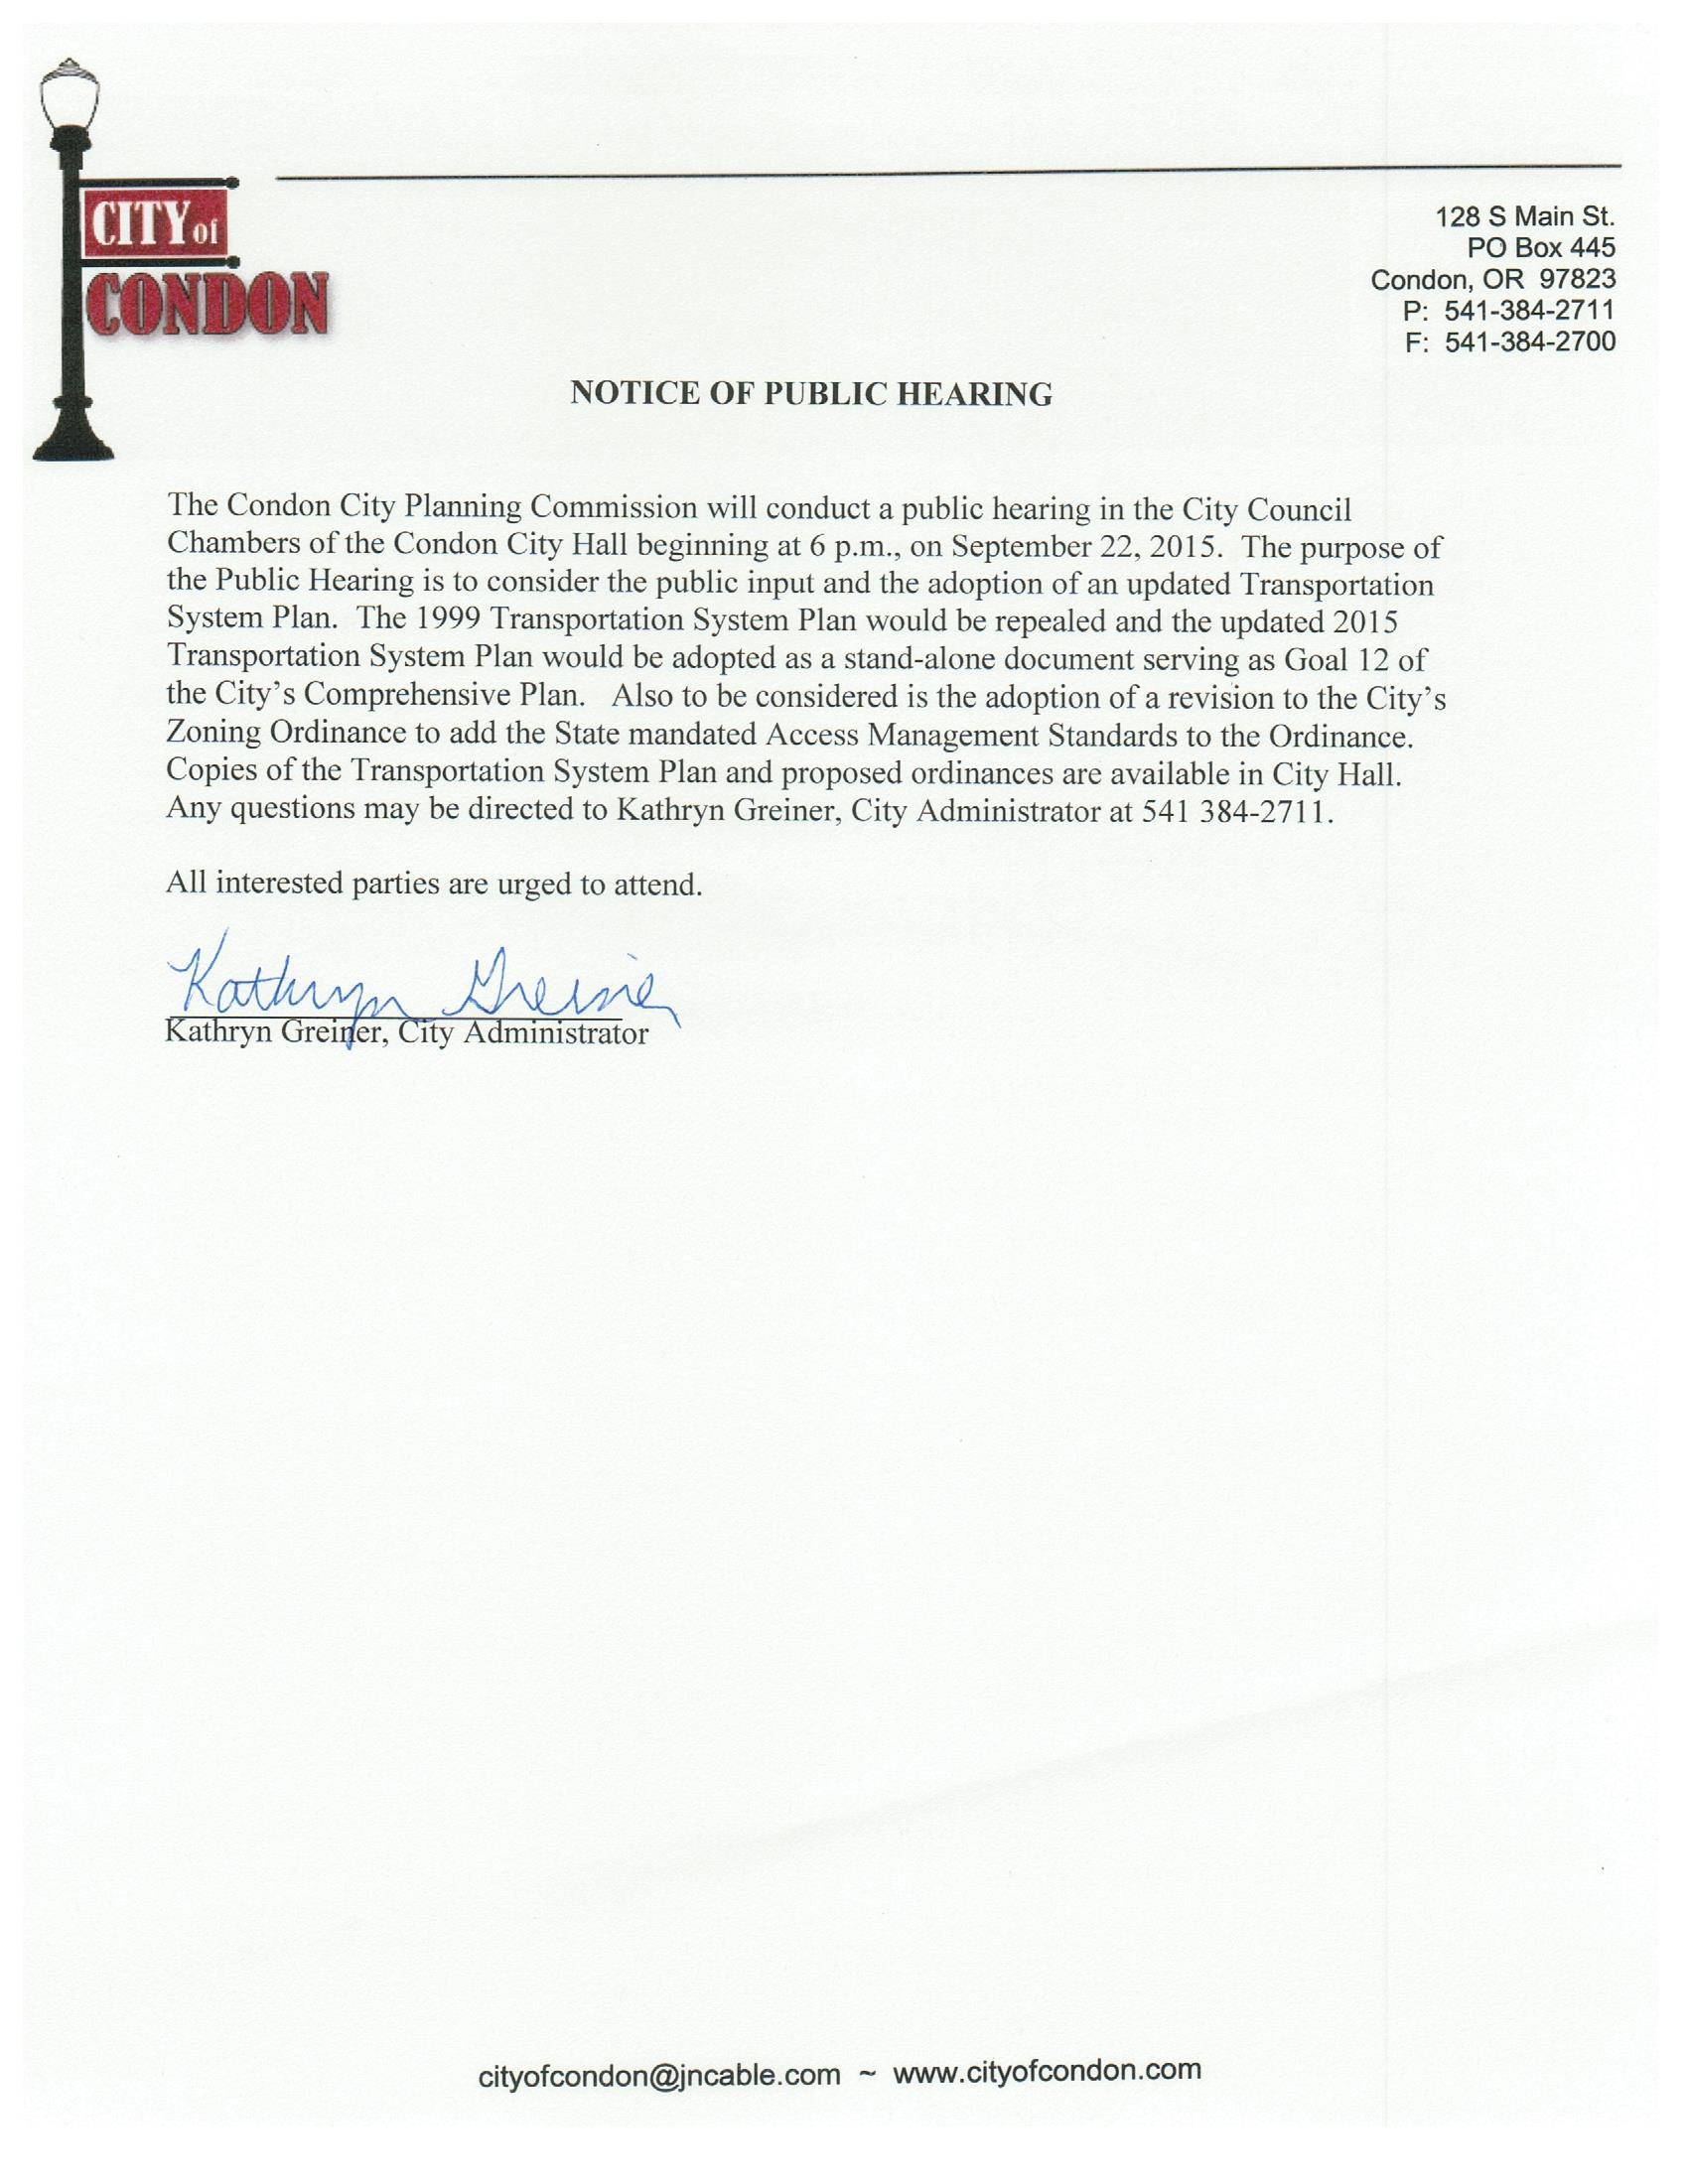 2015-09 TSP Notice